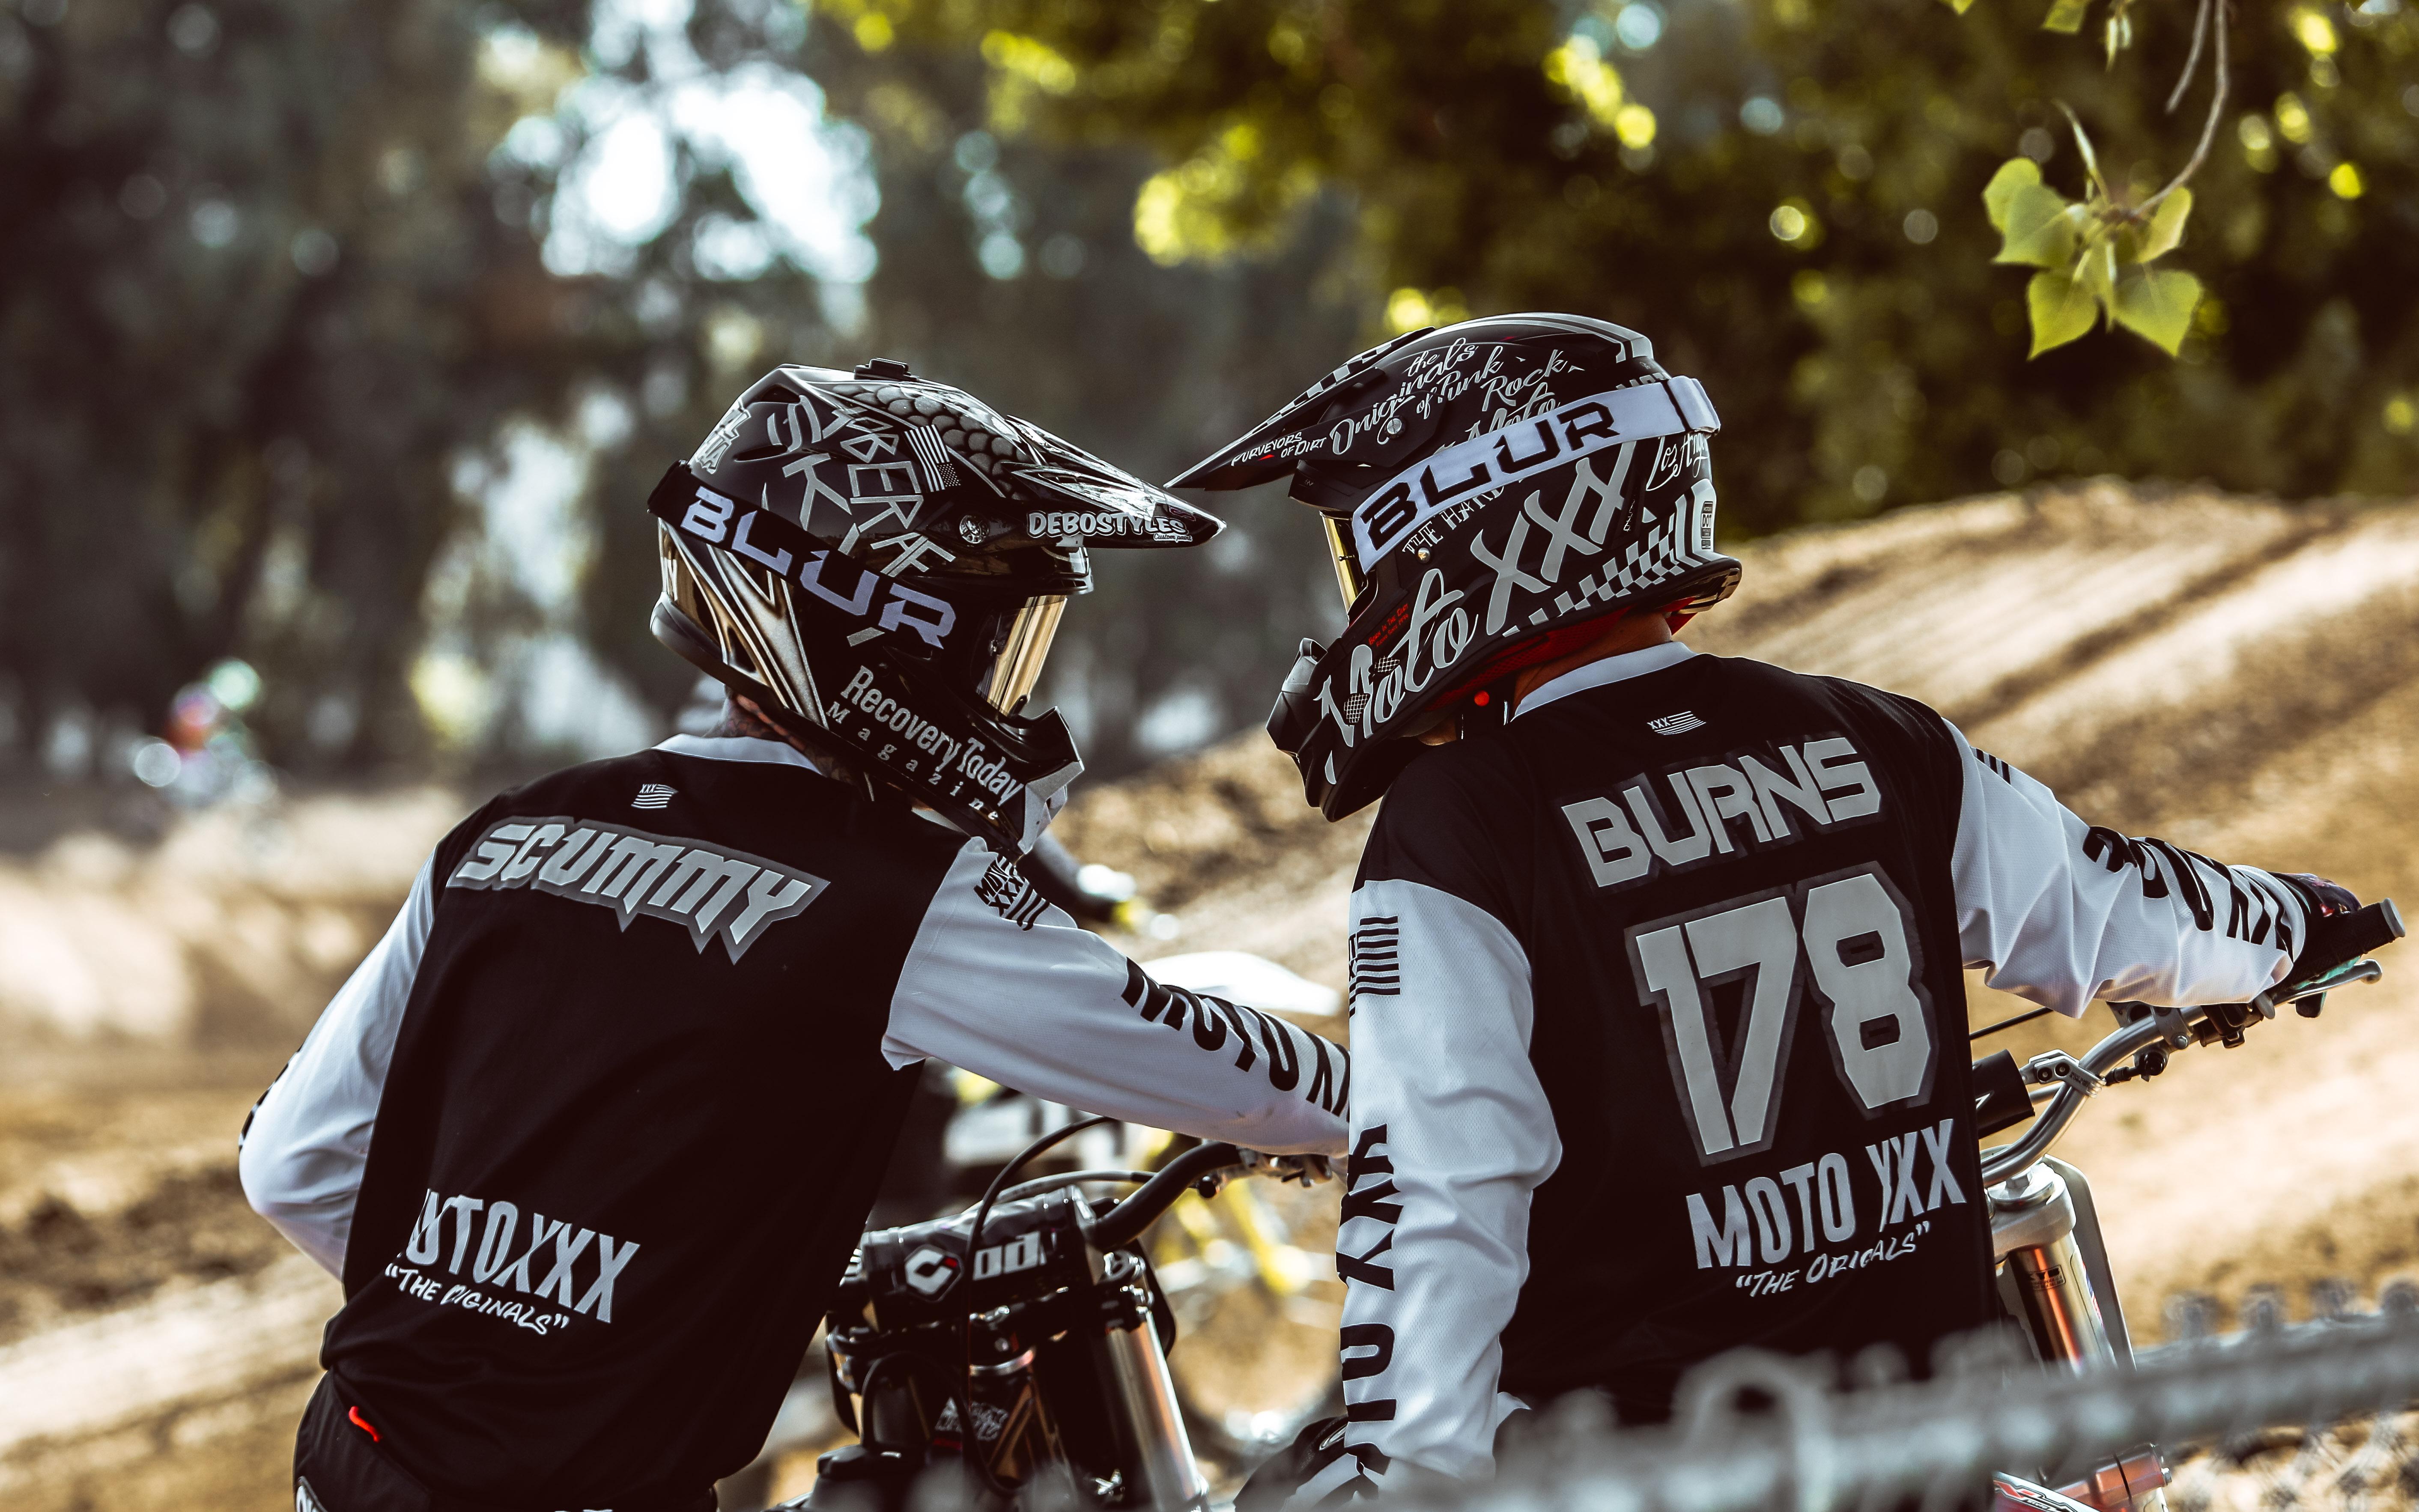 History in Supercross: Interview with Jordan Burns of Moto XXX, Part 2